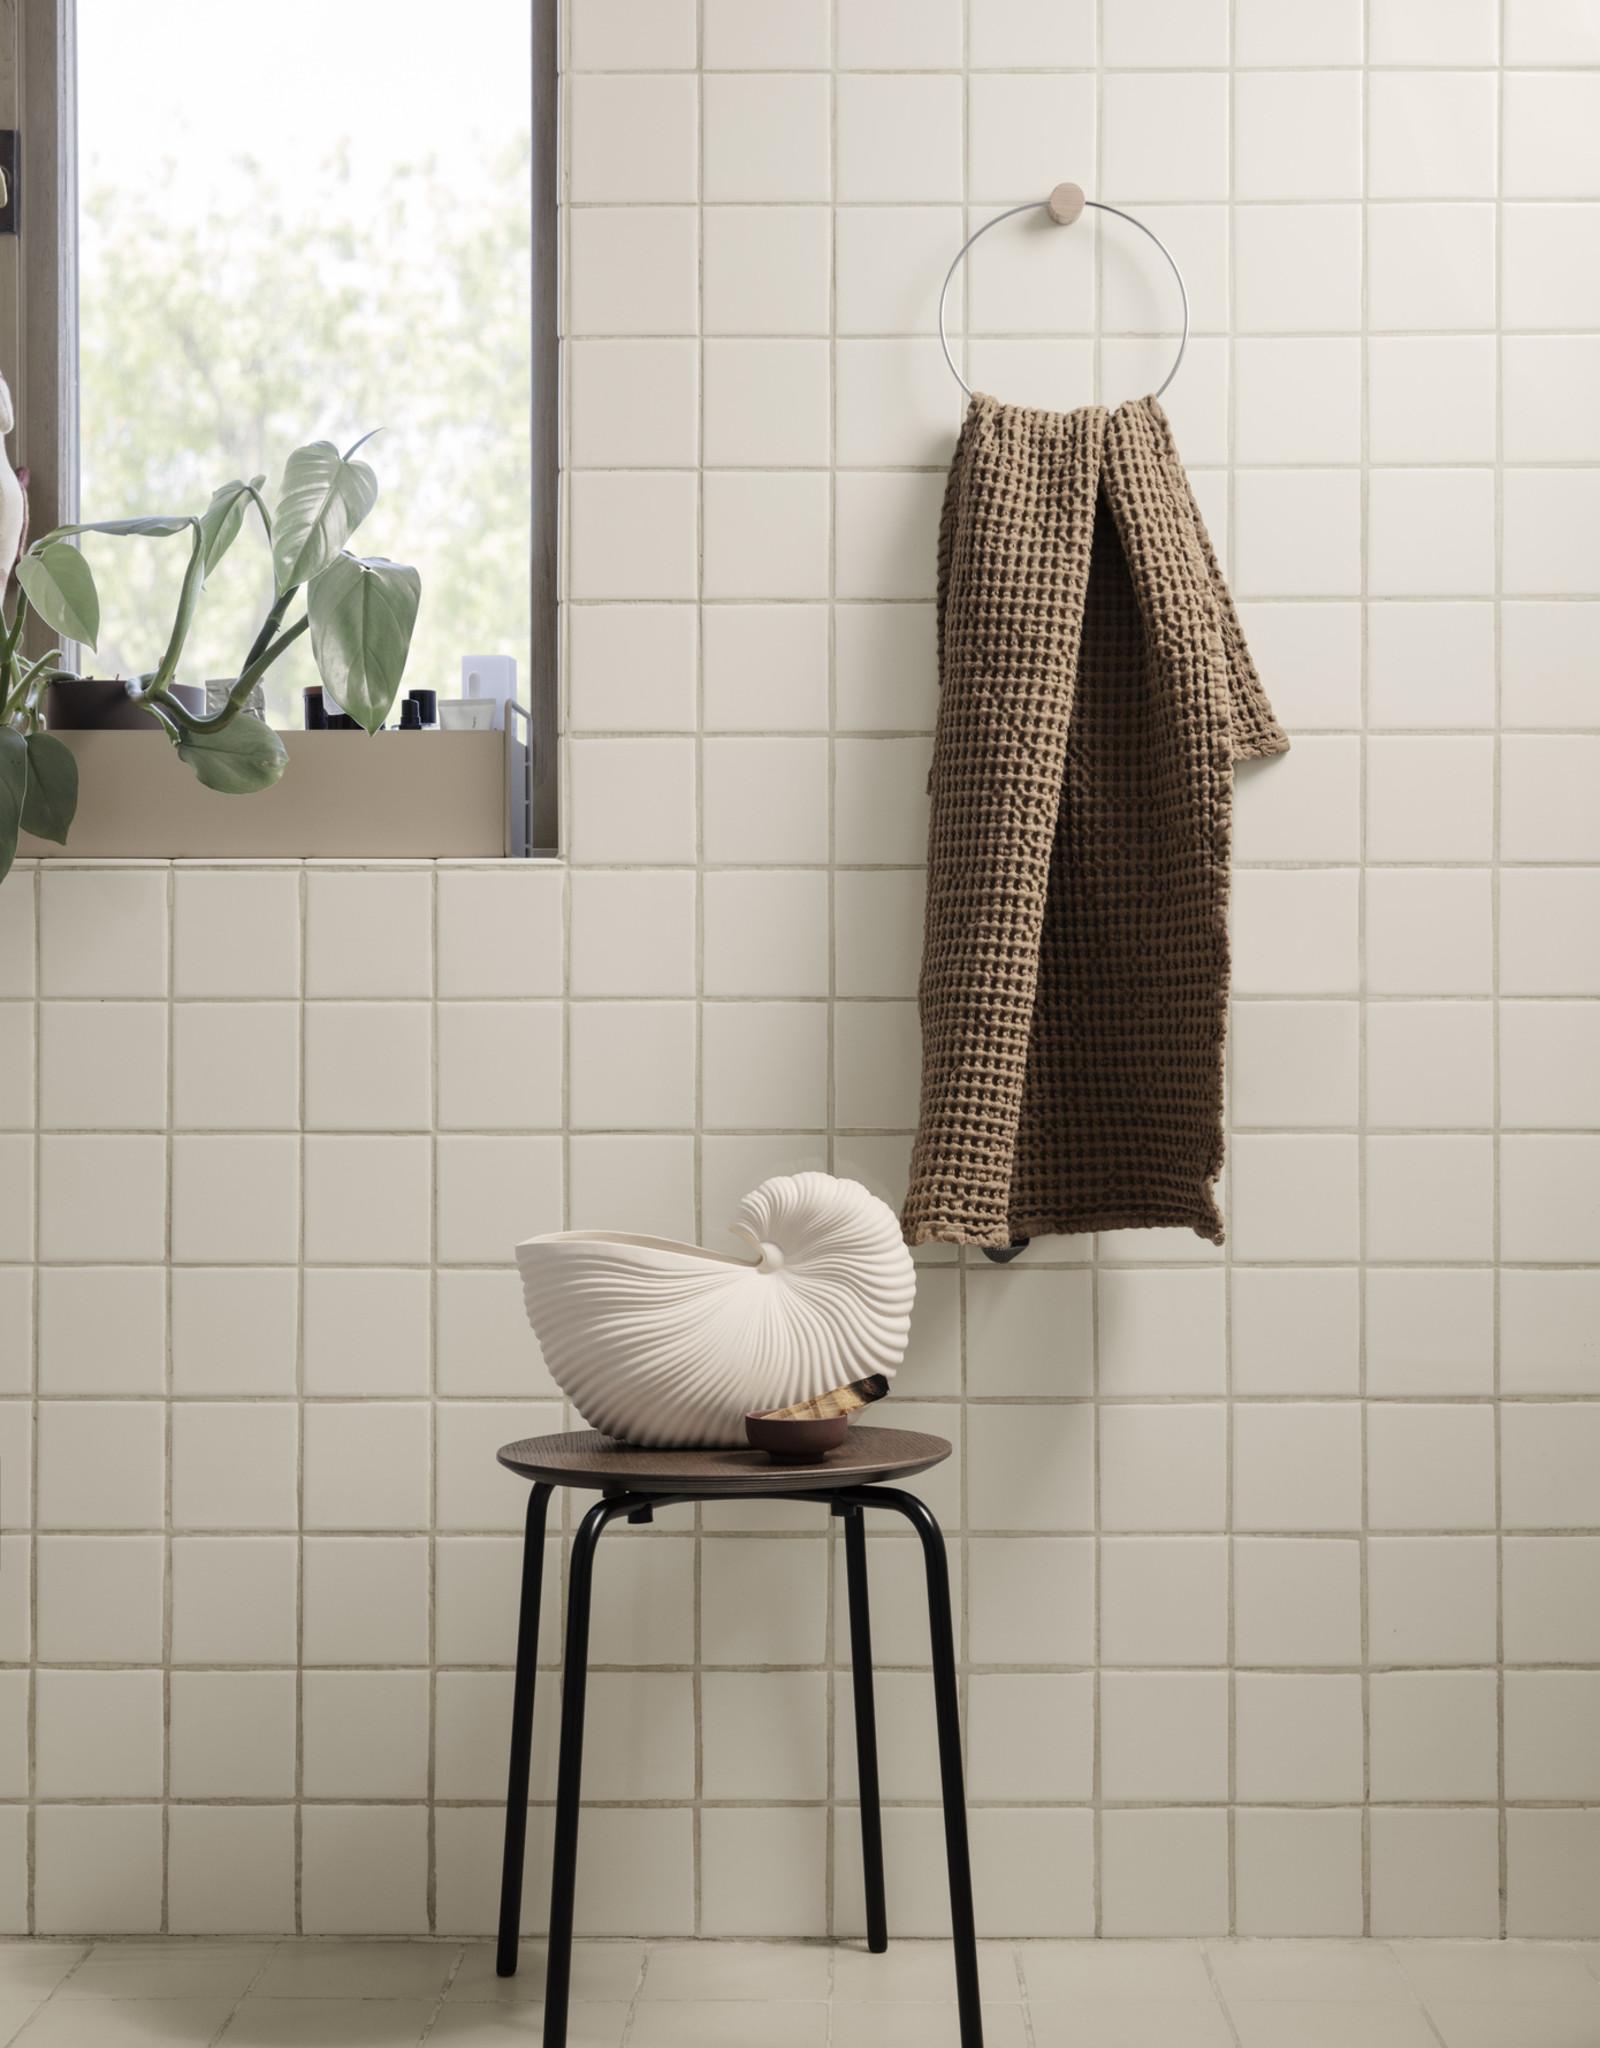 Ferm LIVING Ferm Living Black Towel Hanger